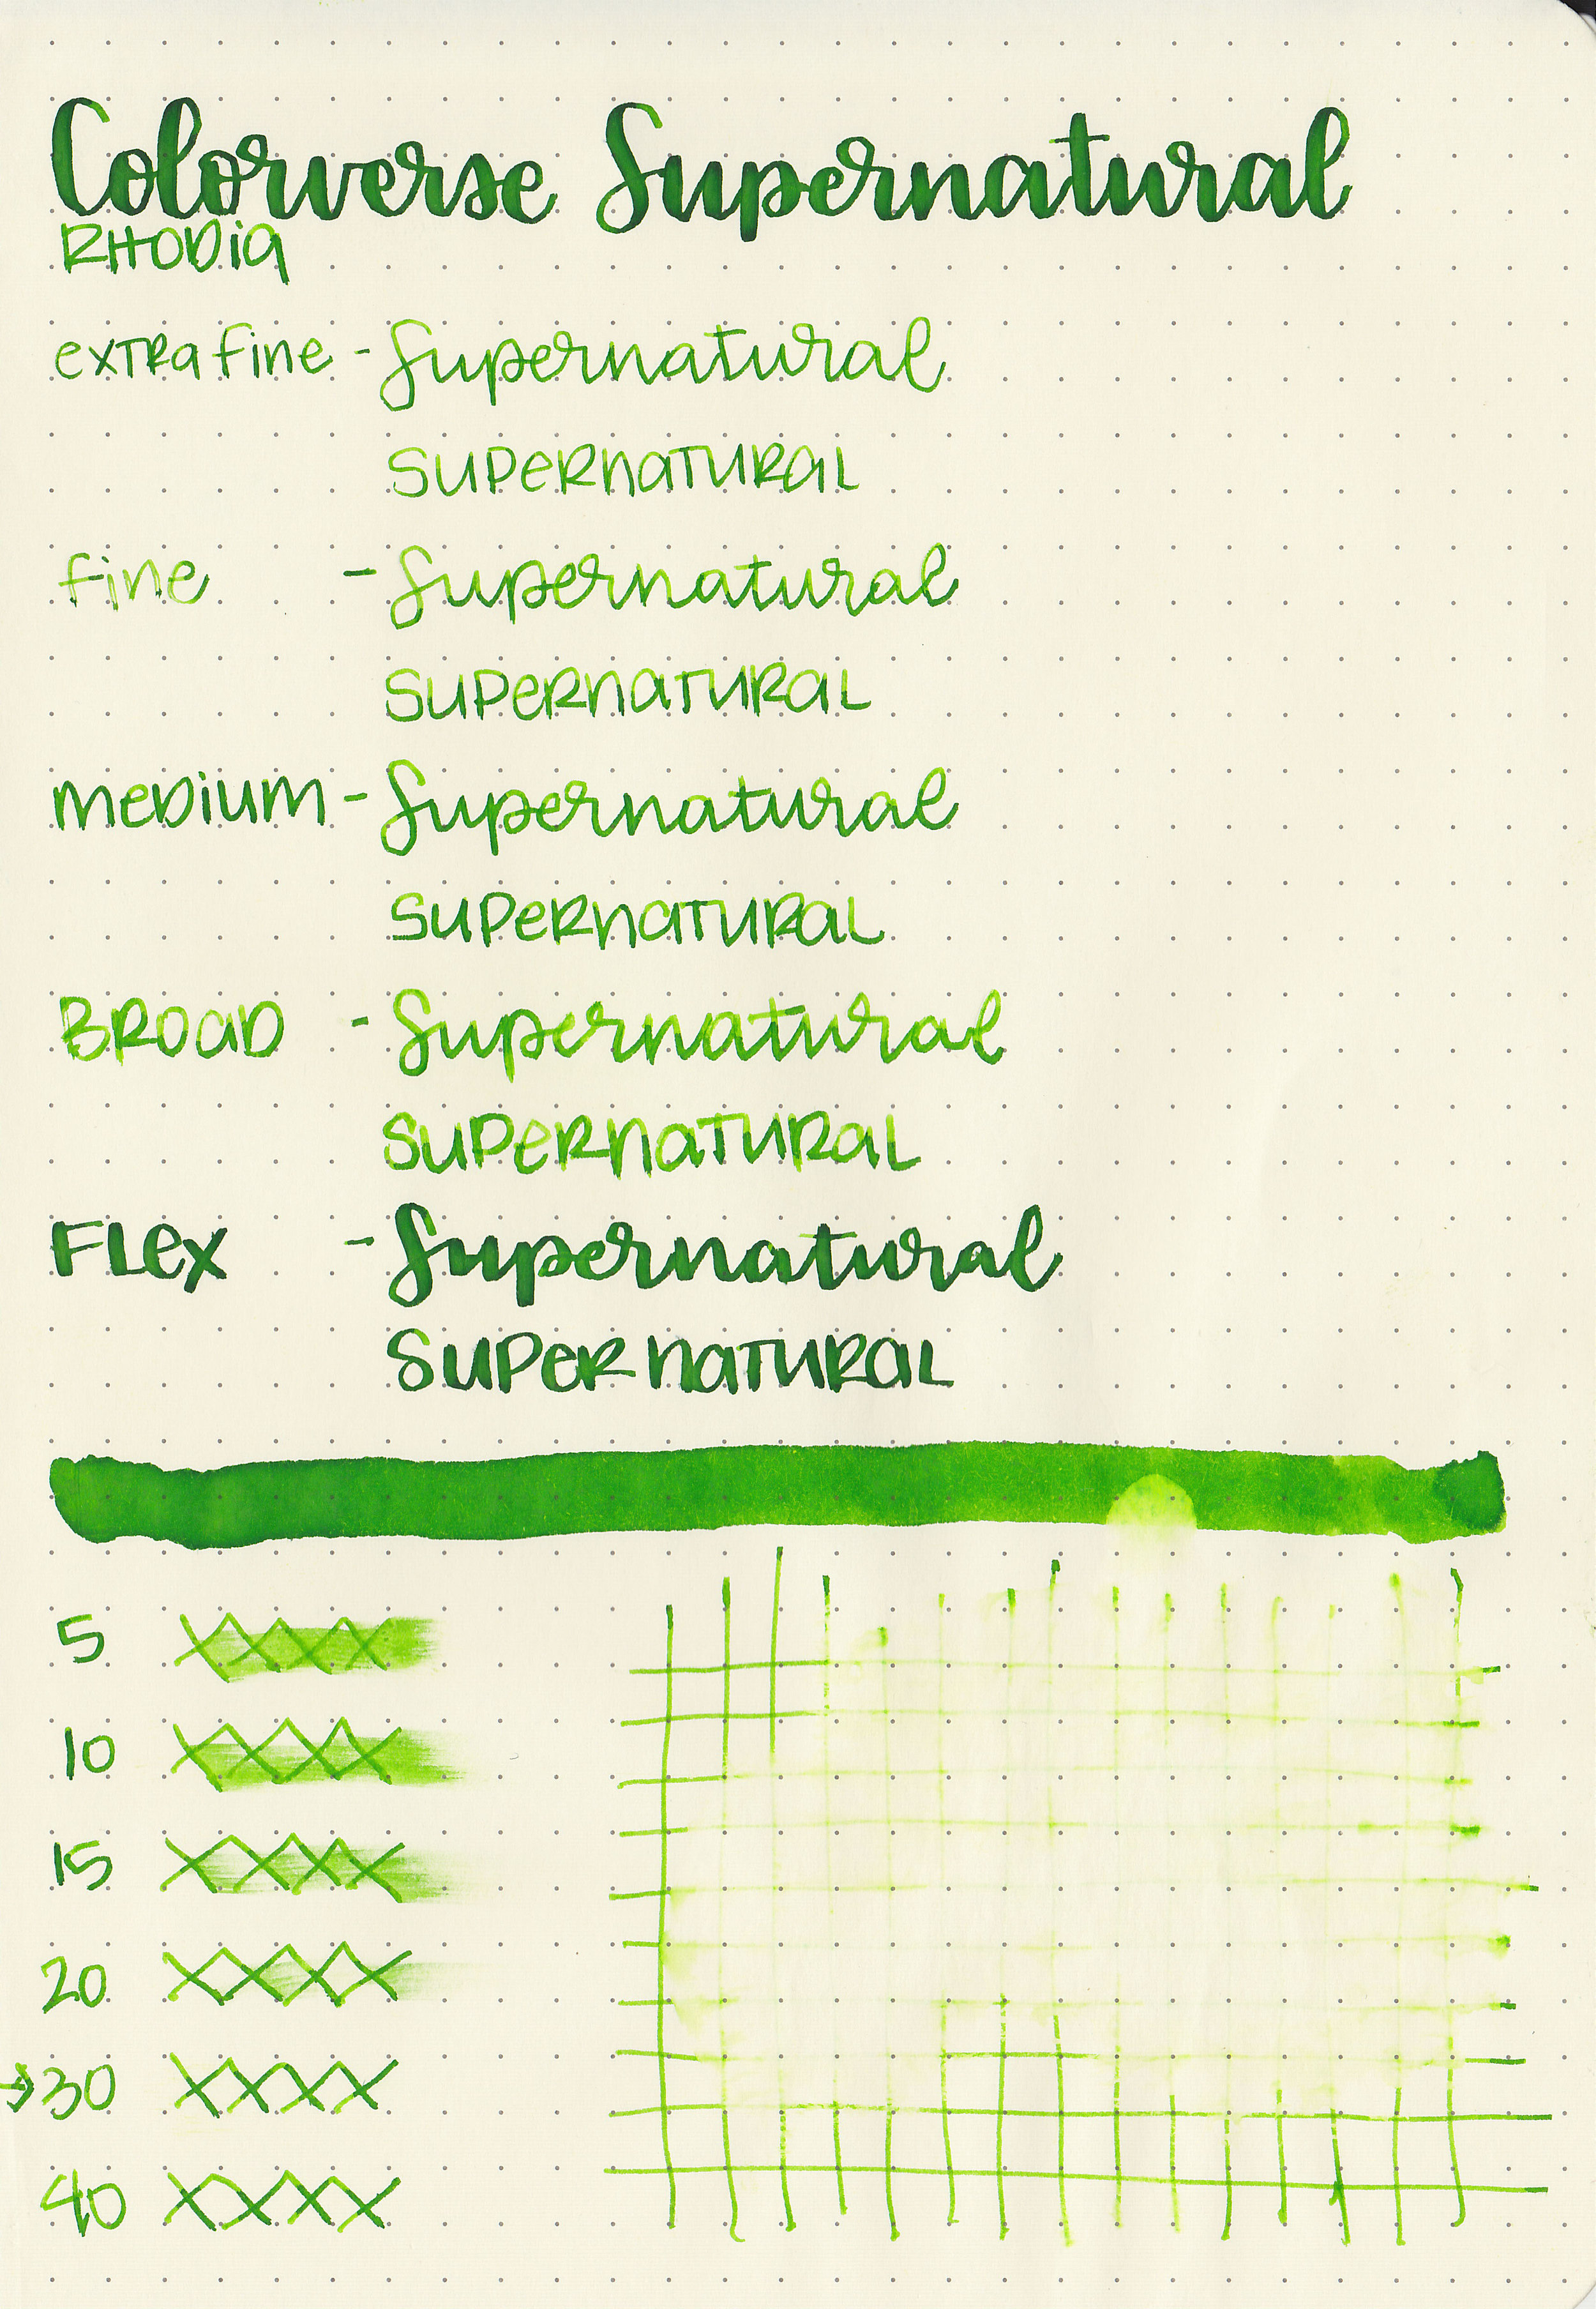 cv-supernatural-5.jpg